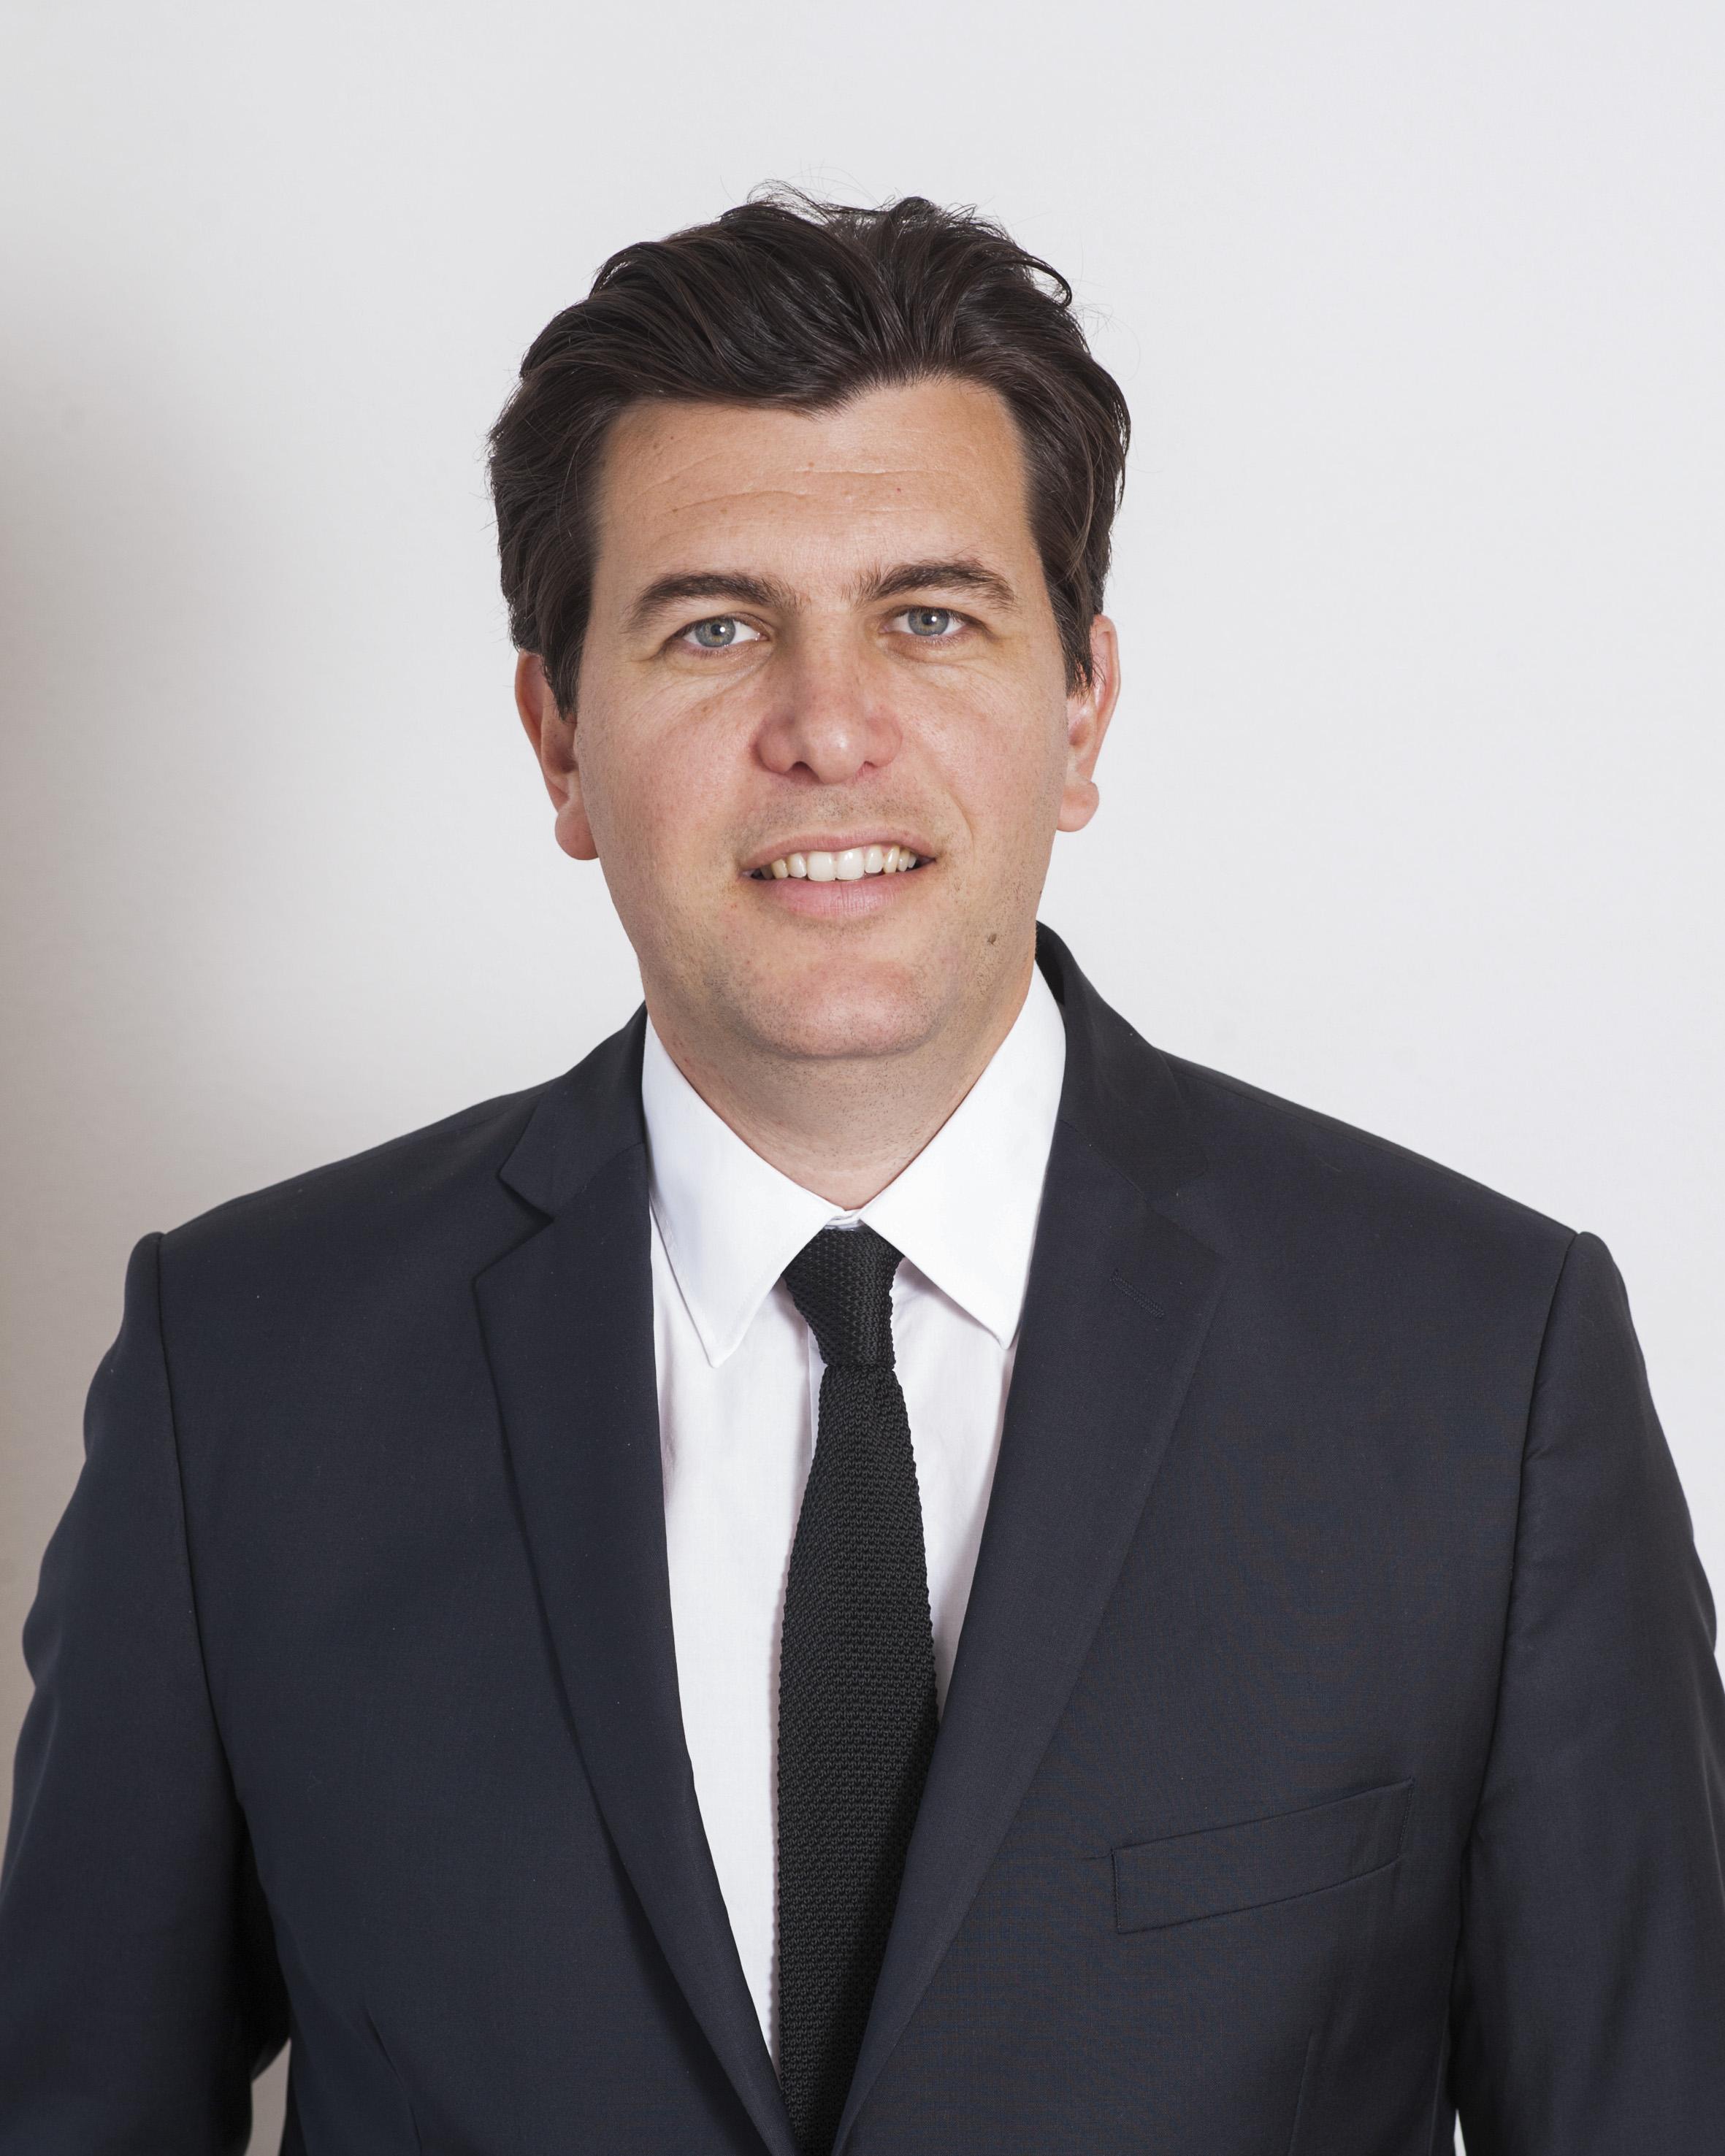 Nicolas Salvagno